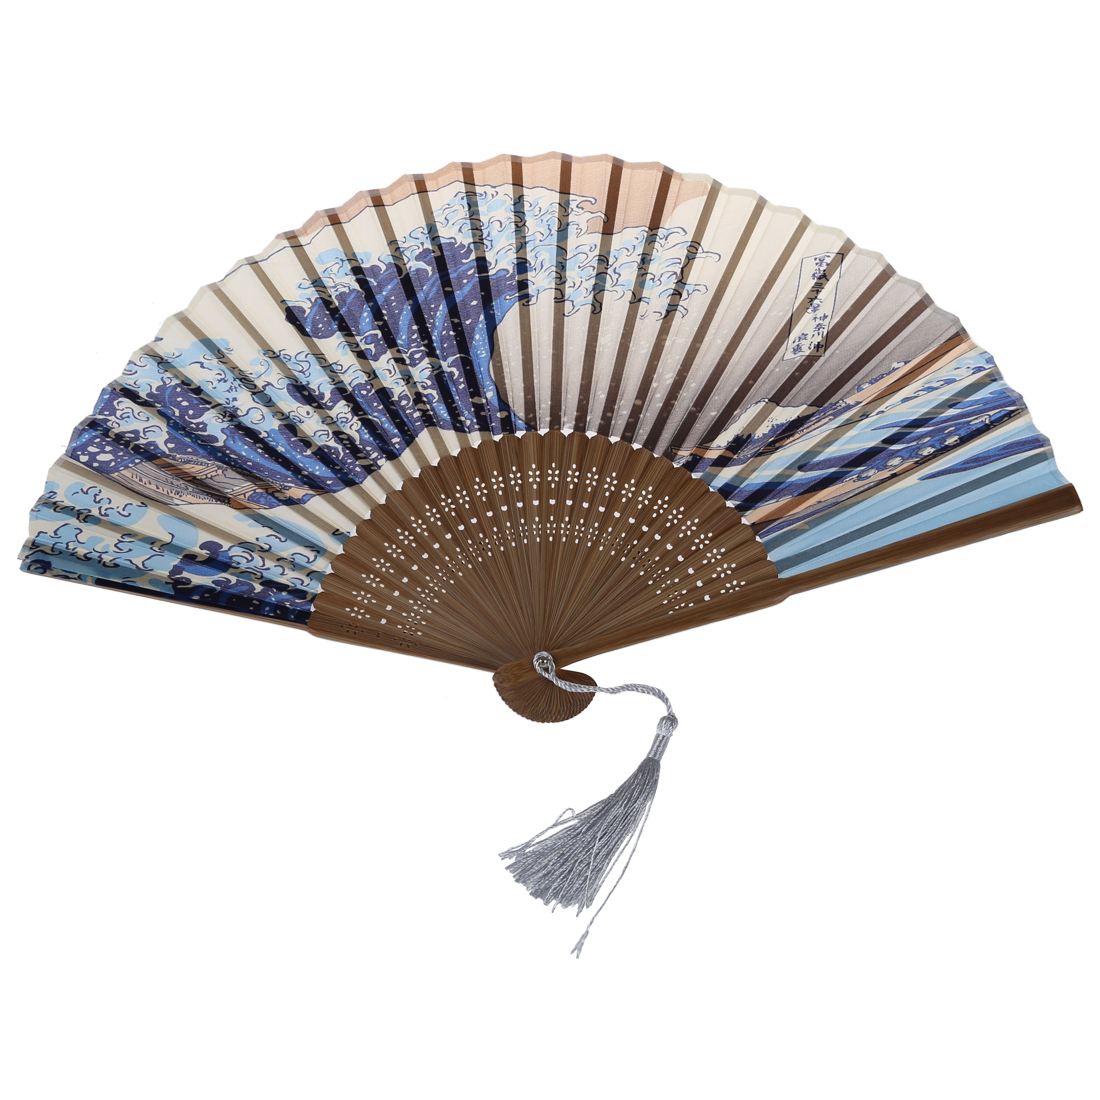 Hot Sale Japanese Handheld Folding Fan, With Traditional Japanese Ukiyo-e Art Prints